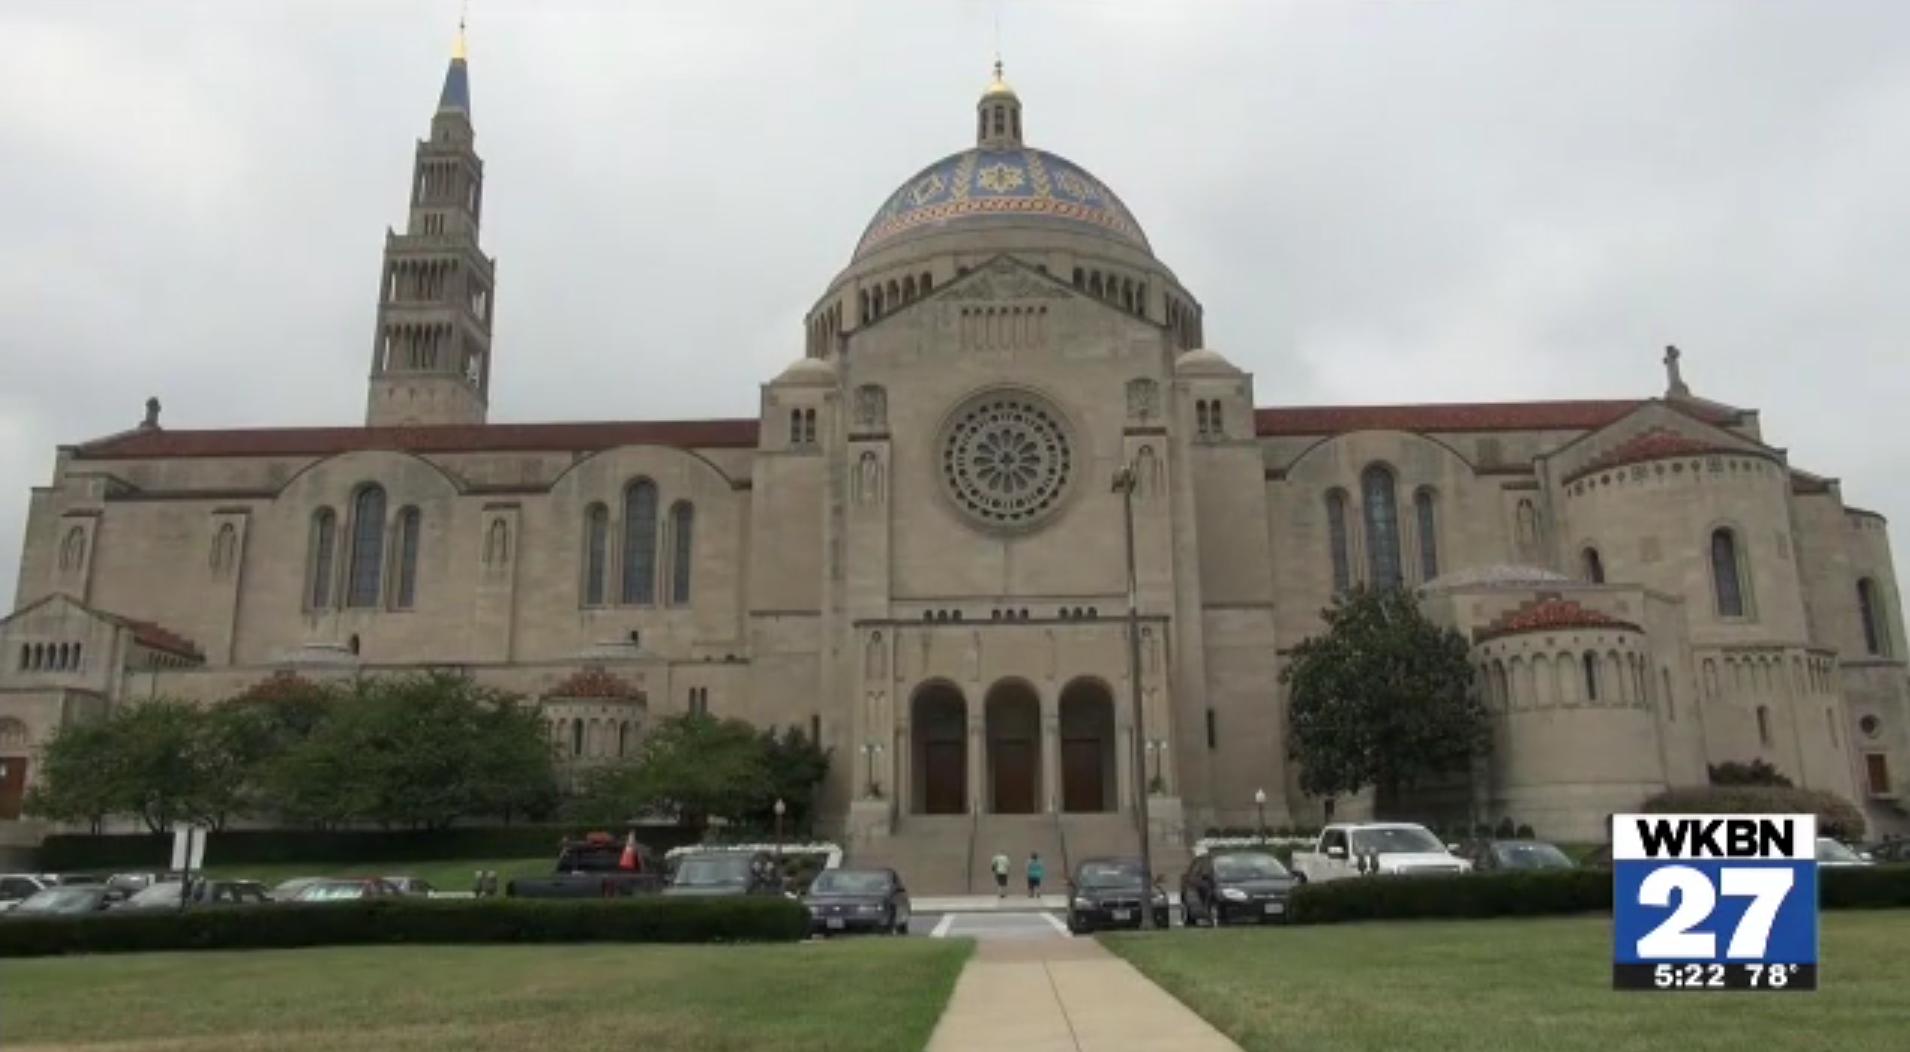 Recent Catholic University graduates design papal furniture